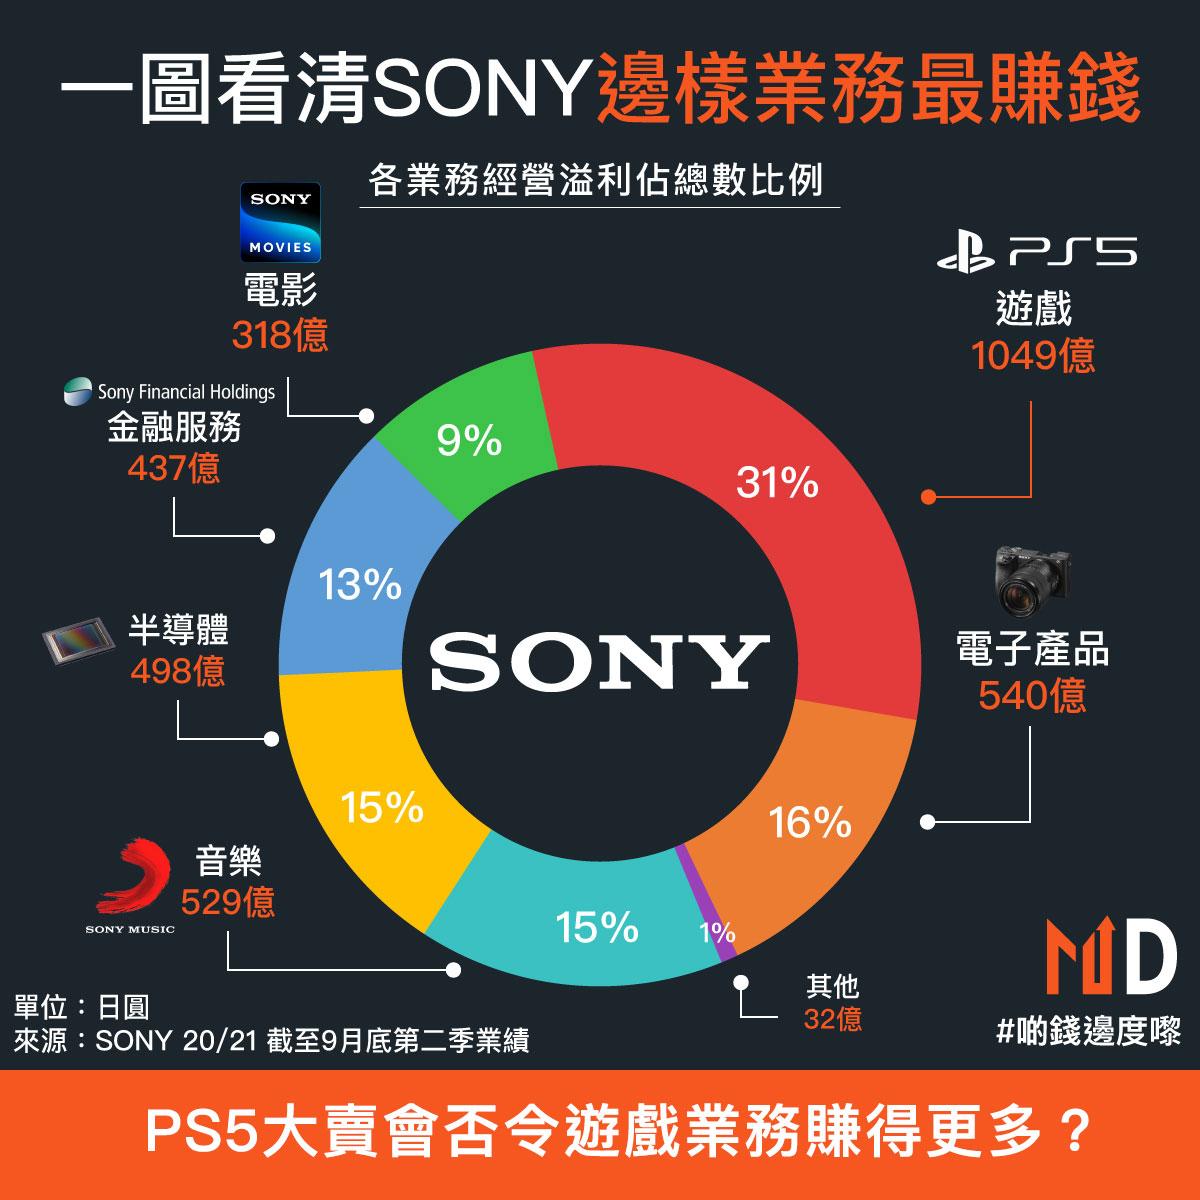 SONY ps5在全球大賣